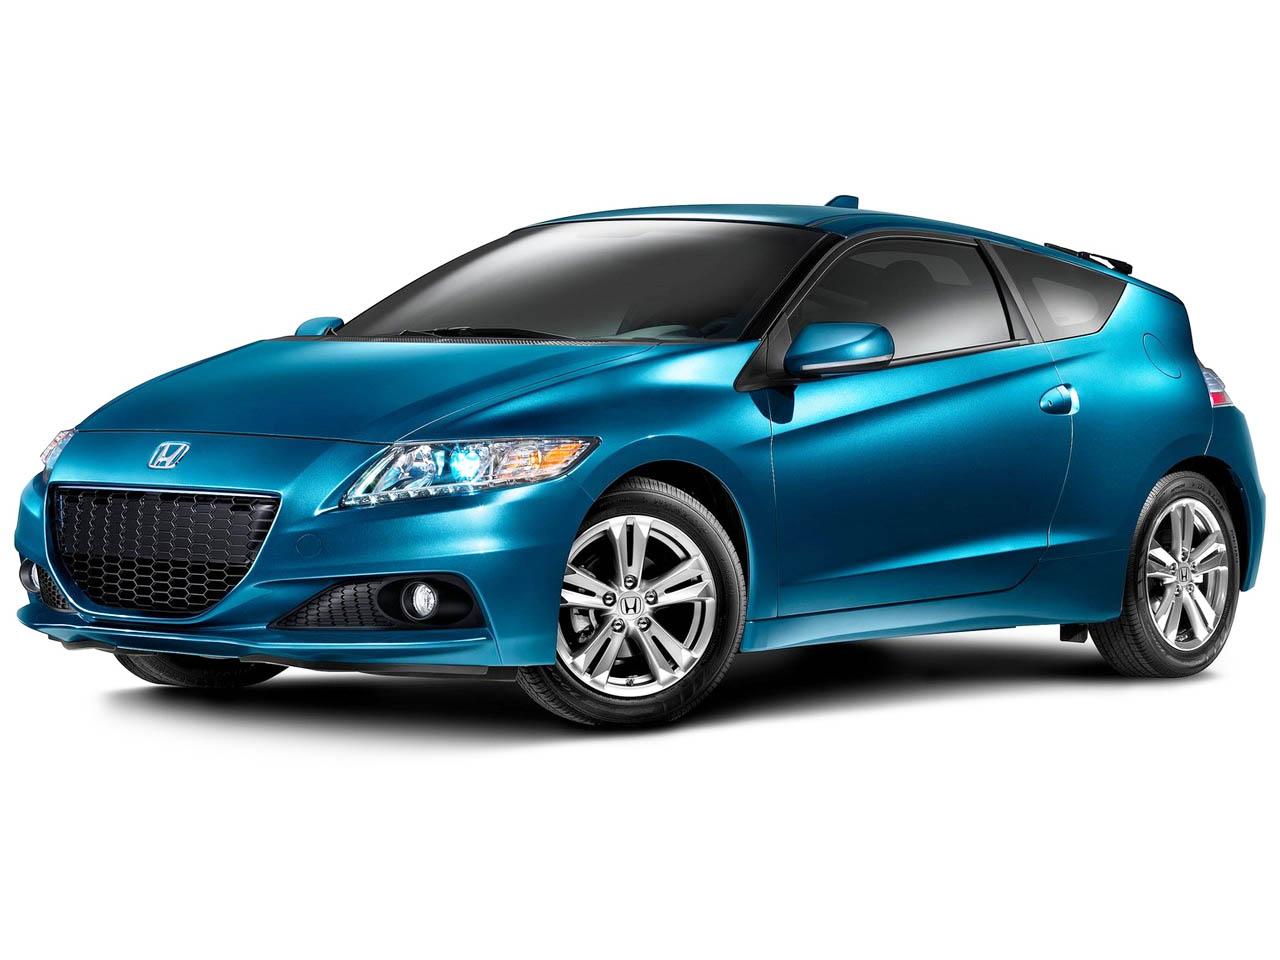 Smart Car Honda >> Honda Cr Z Smart Car Manufacured By Honda Views Car